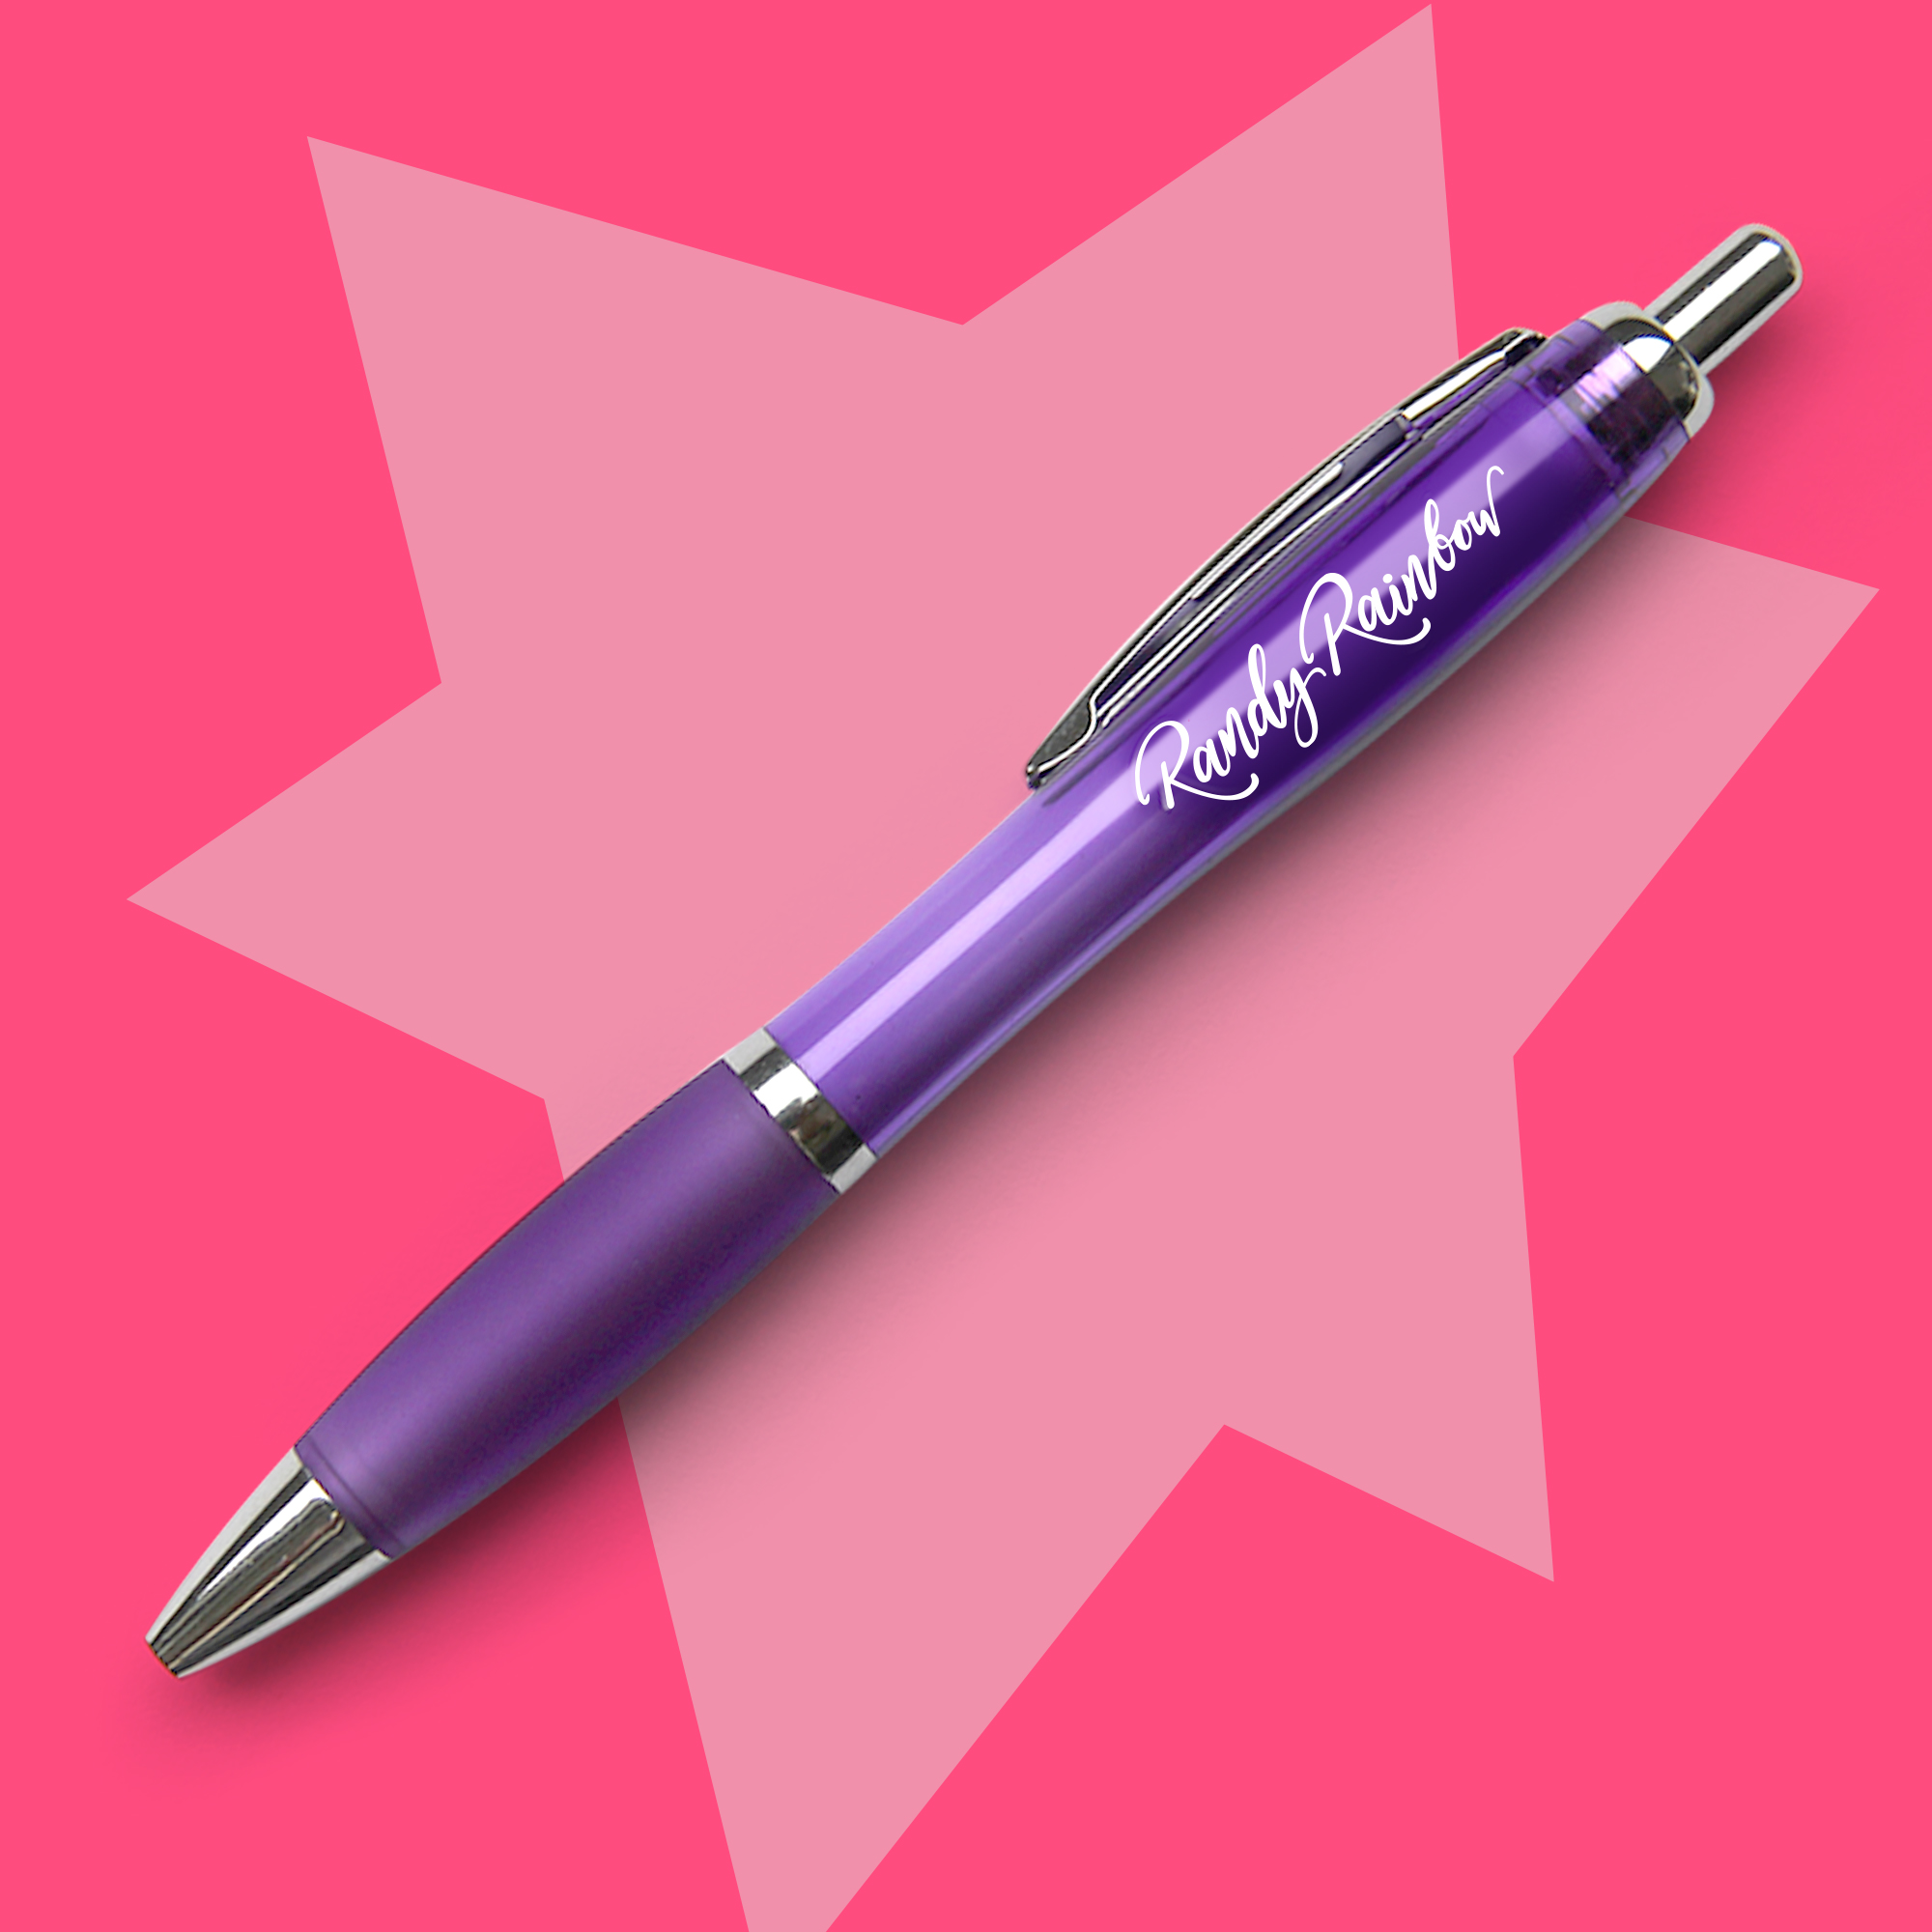 Pen on Color@2x.jpg